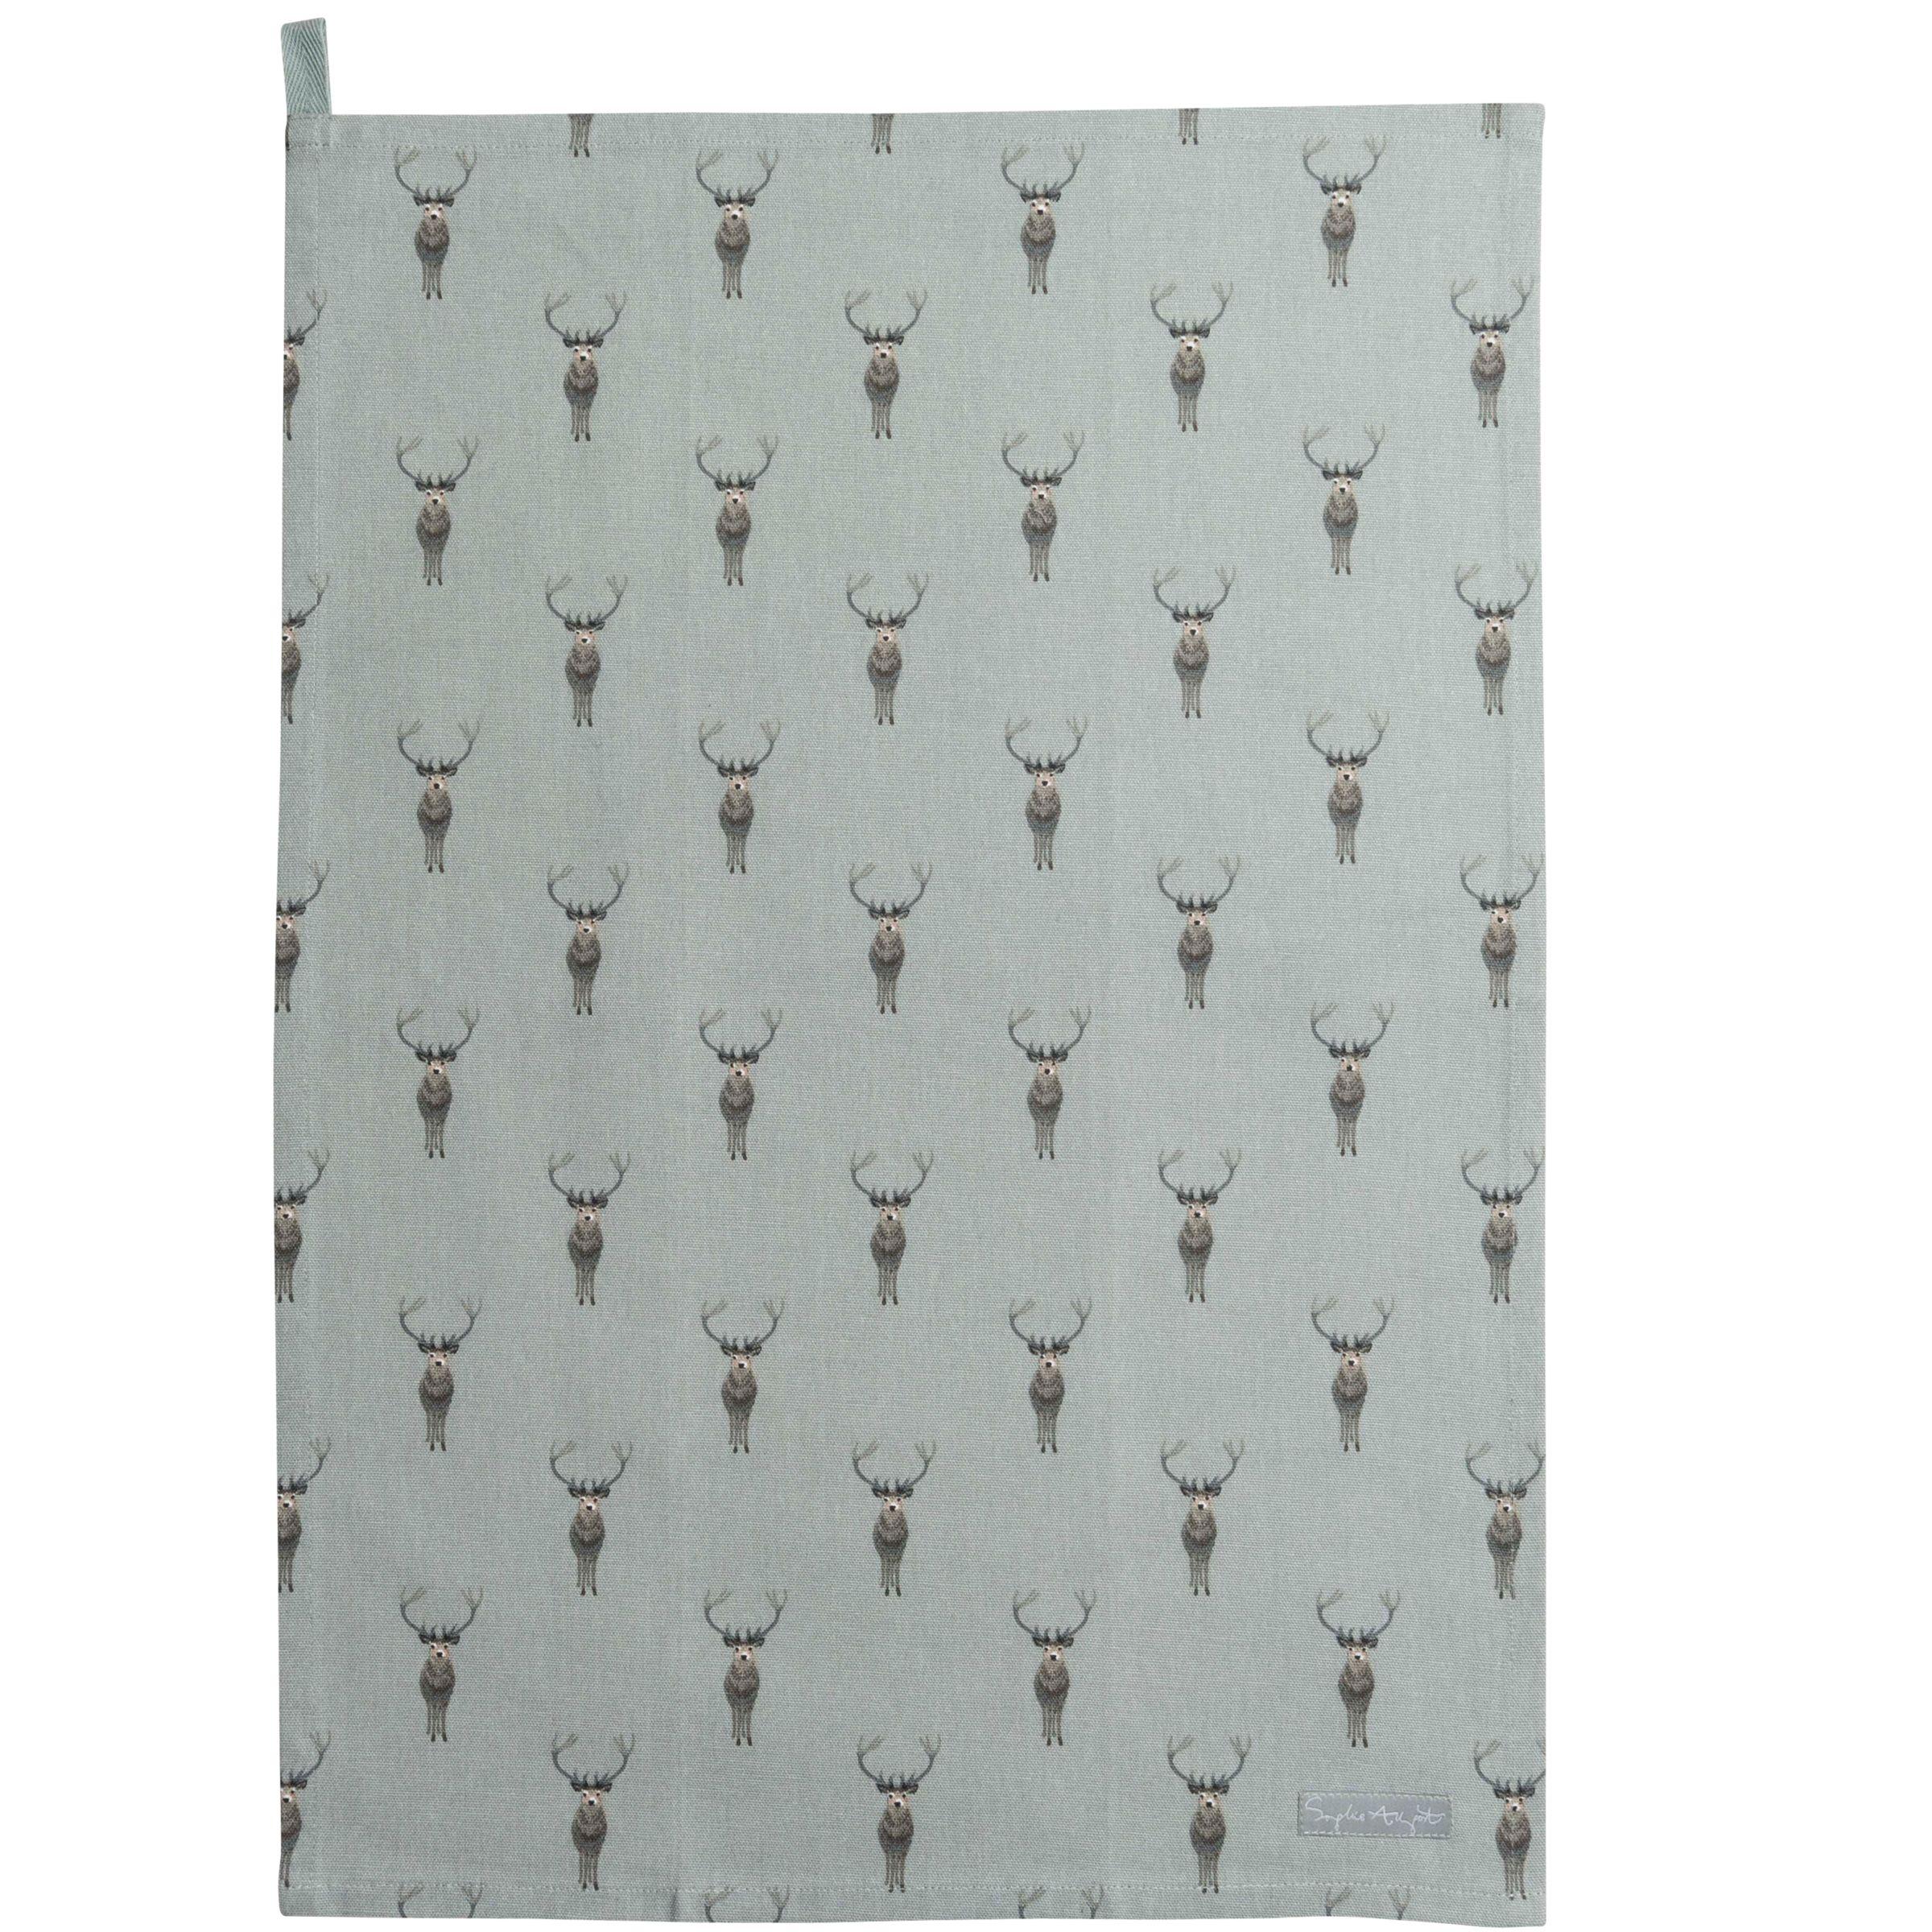 Sophie Allport Sophie Allport Stag Tea Towel